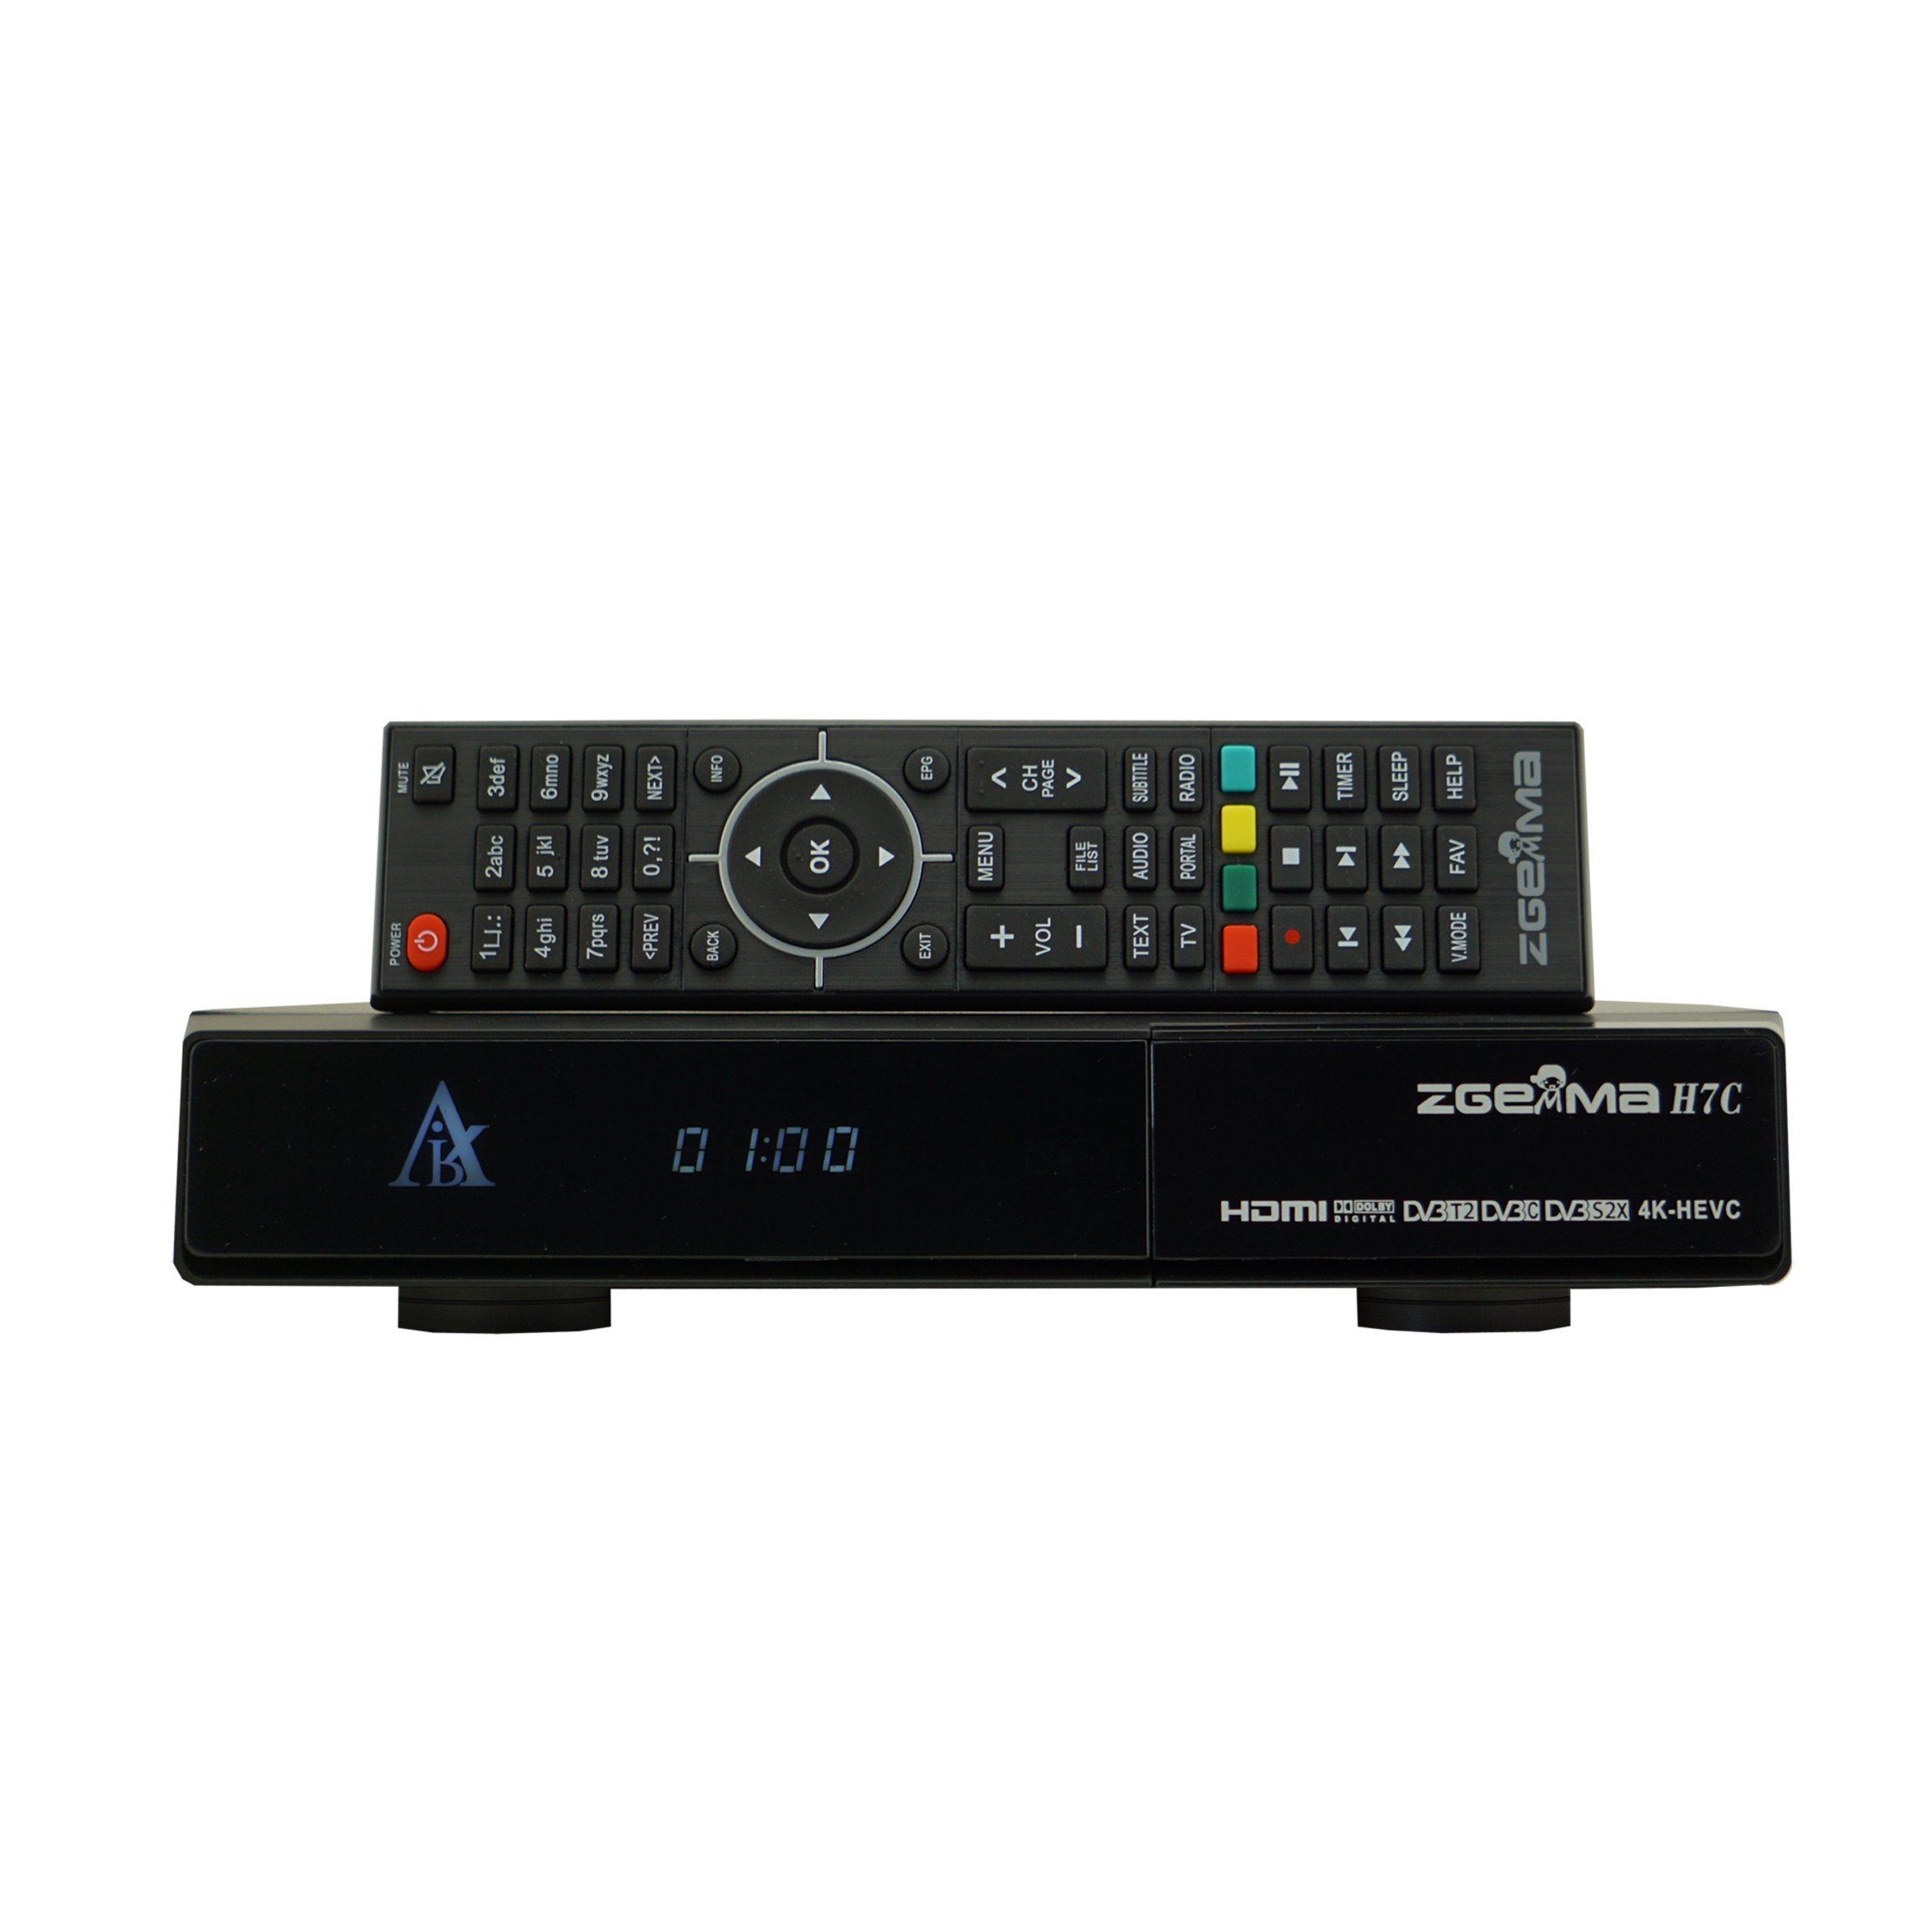 New 4K Satellite Receiver Zgemma H7c with DVB-S2X+2*DVB-T2/C Three Tuners